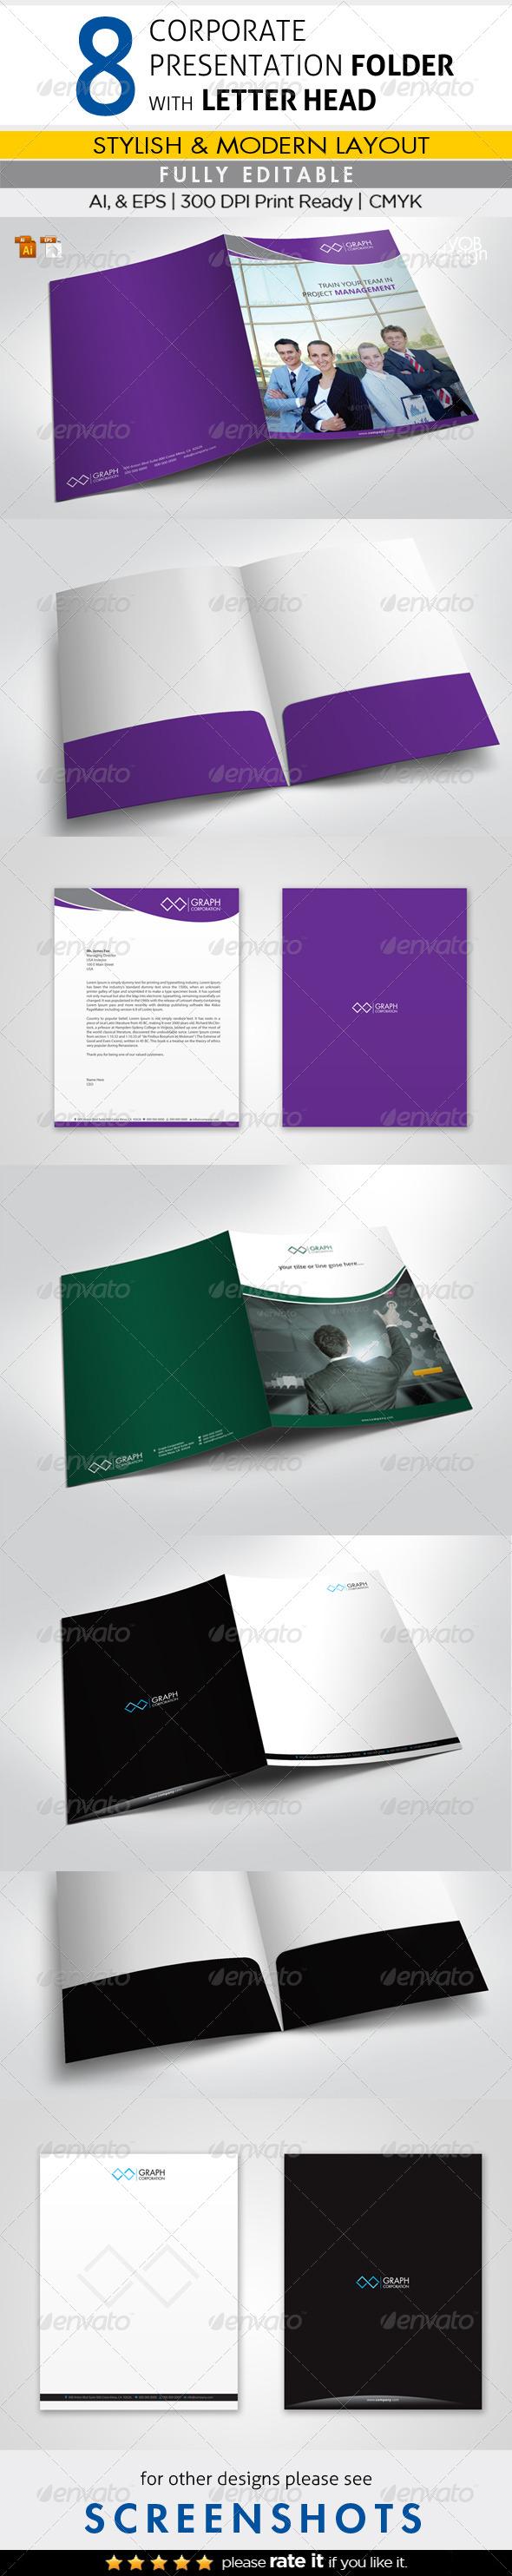 Presentation Folders with Letterheads - Stationery Print Templates